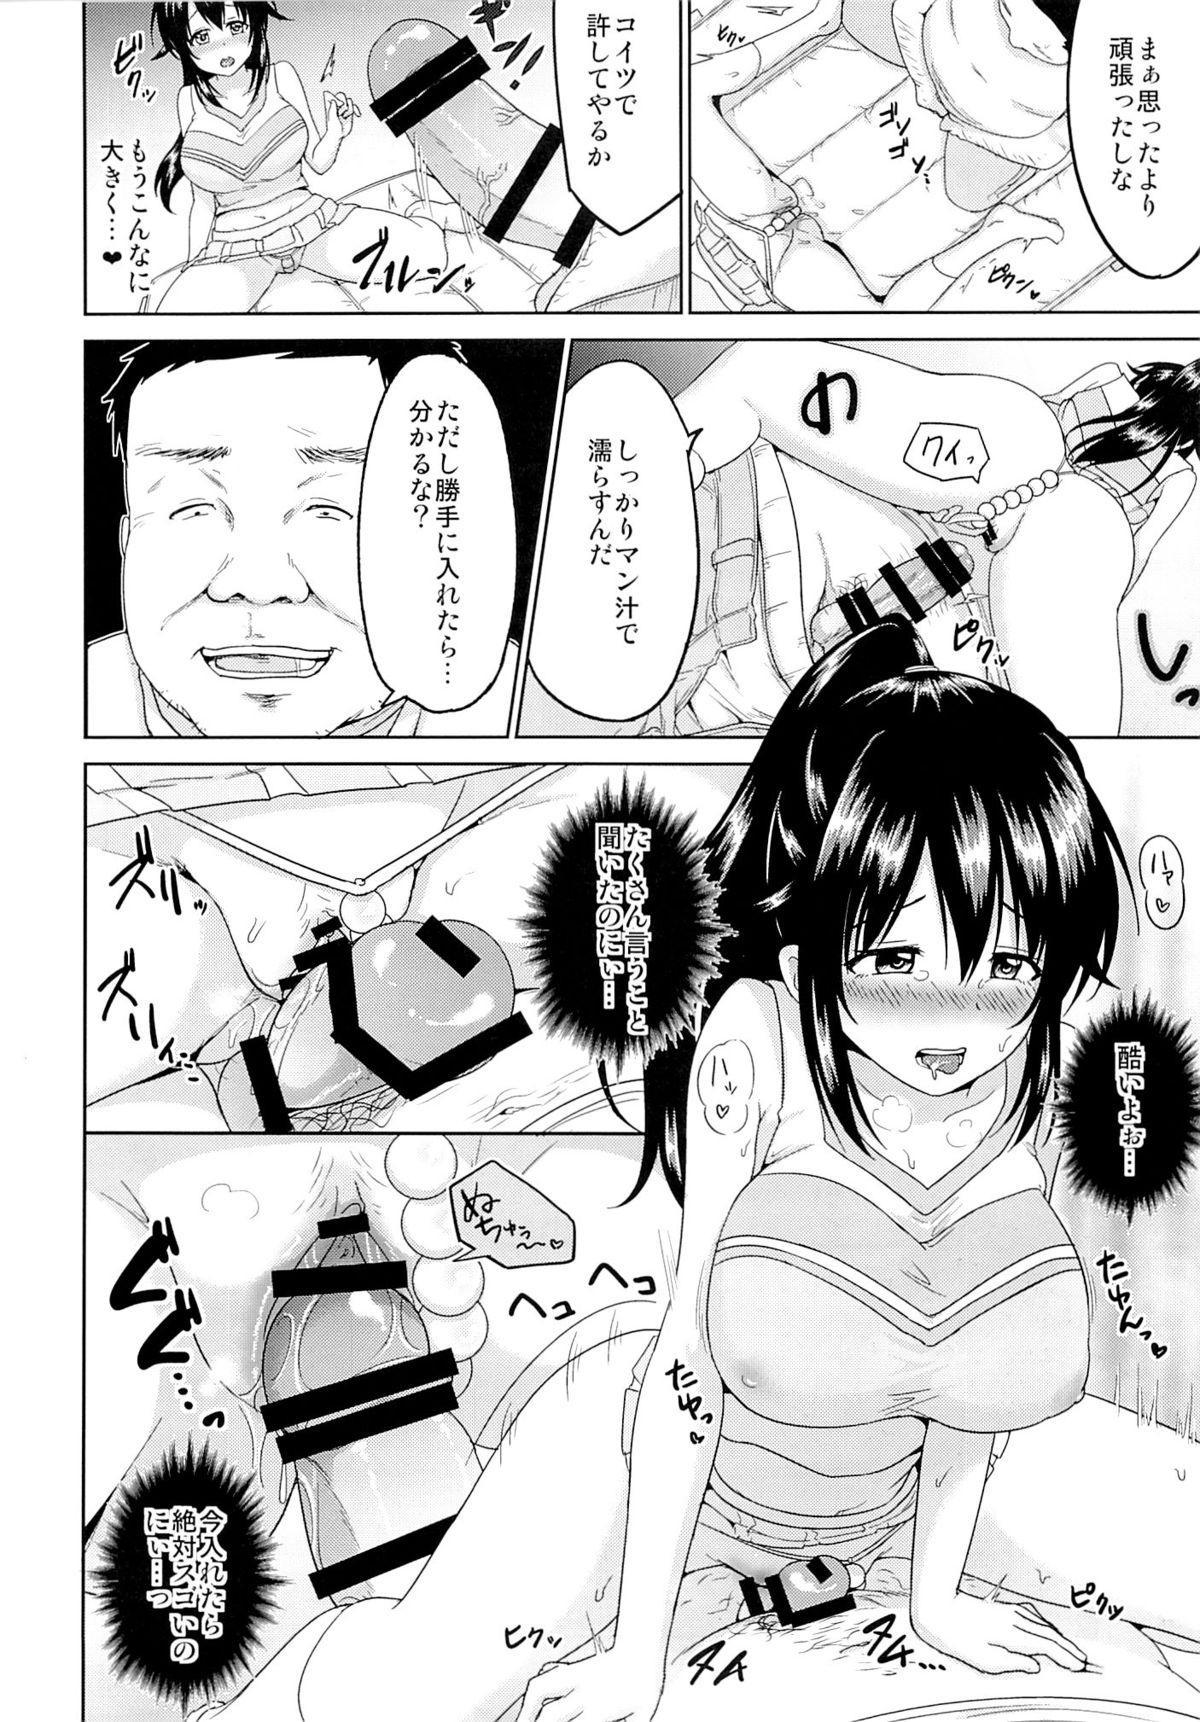 Sachi-chan no Arbeit 3 16